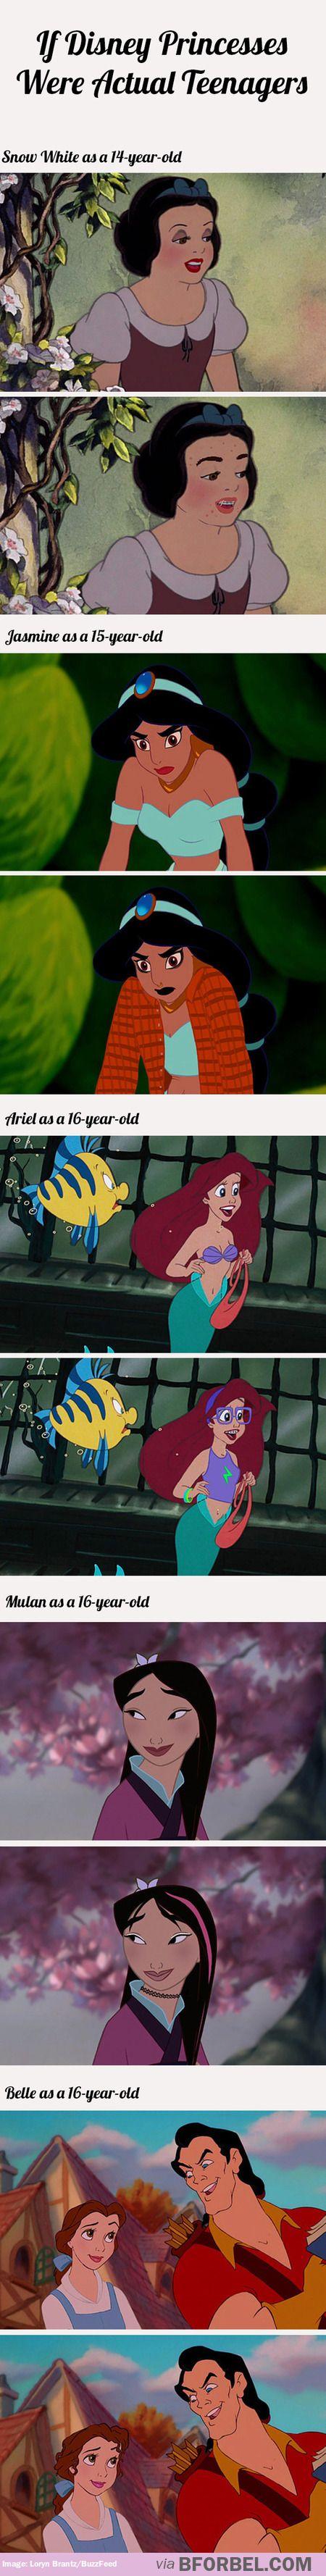 If Disney Princesses were actual teenagers…